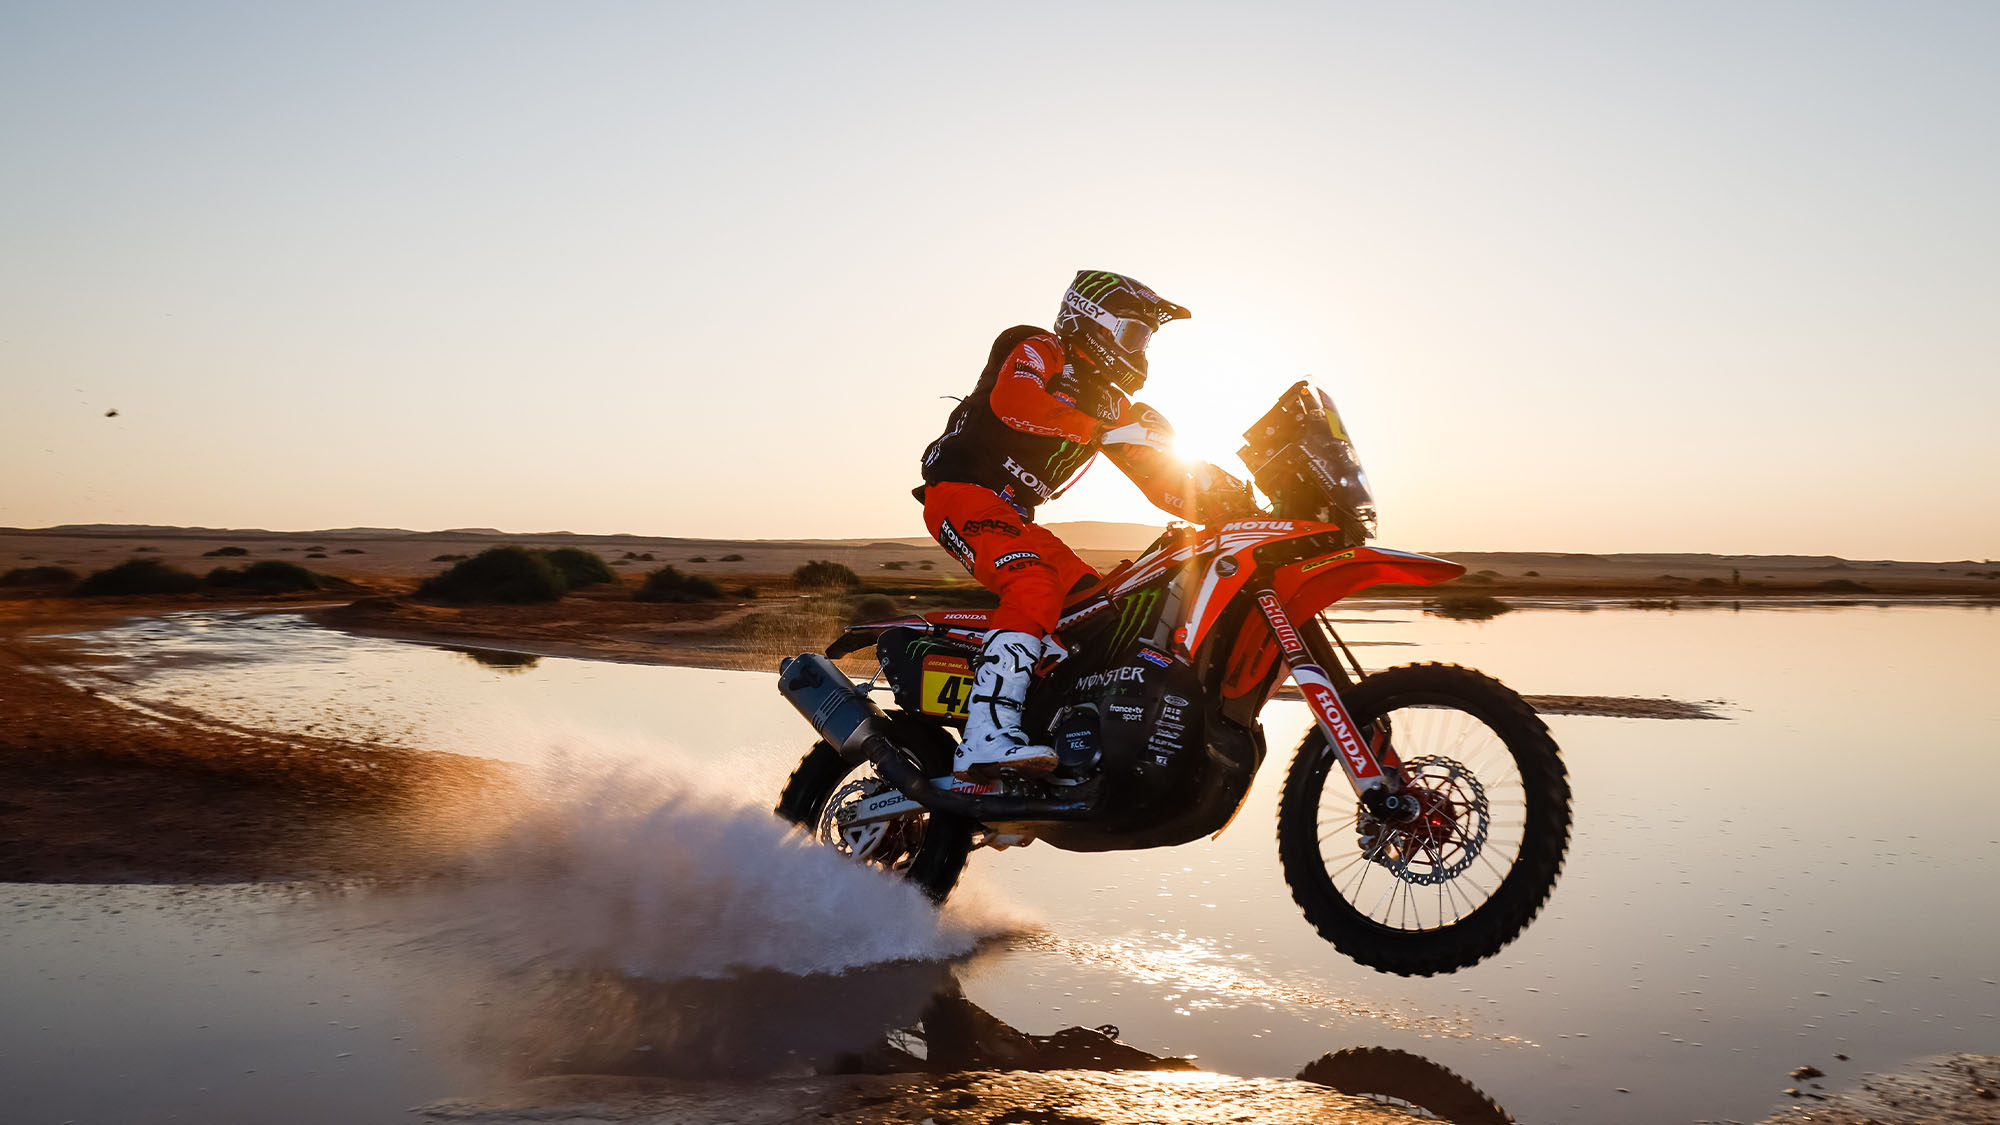 47 Benavides Kevin (arg), Honda, Monster Energy Honda Team 2021, Motul, Moto, Bike, action during the 9th stage of the Dakar 2021 between Neom and Neom, in Saudi Arabia on January 12, 2021